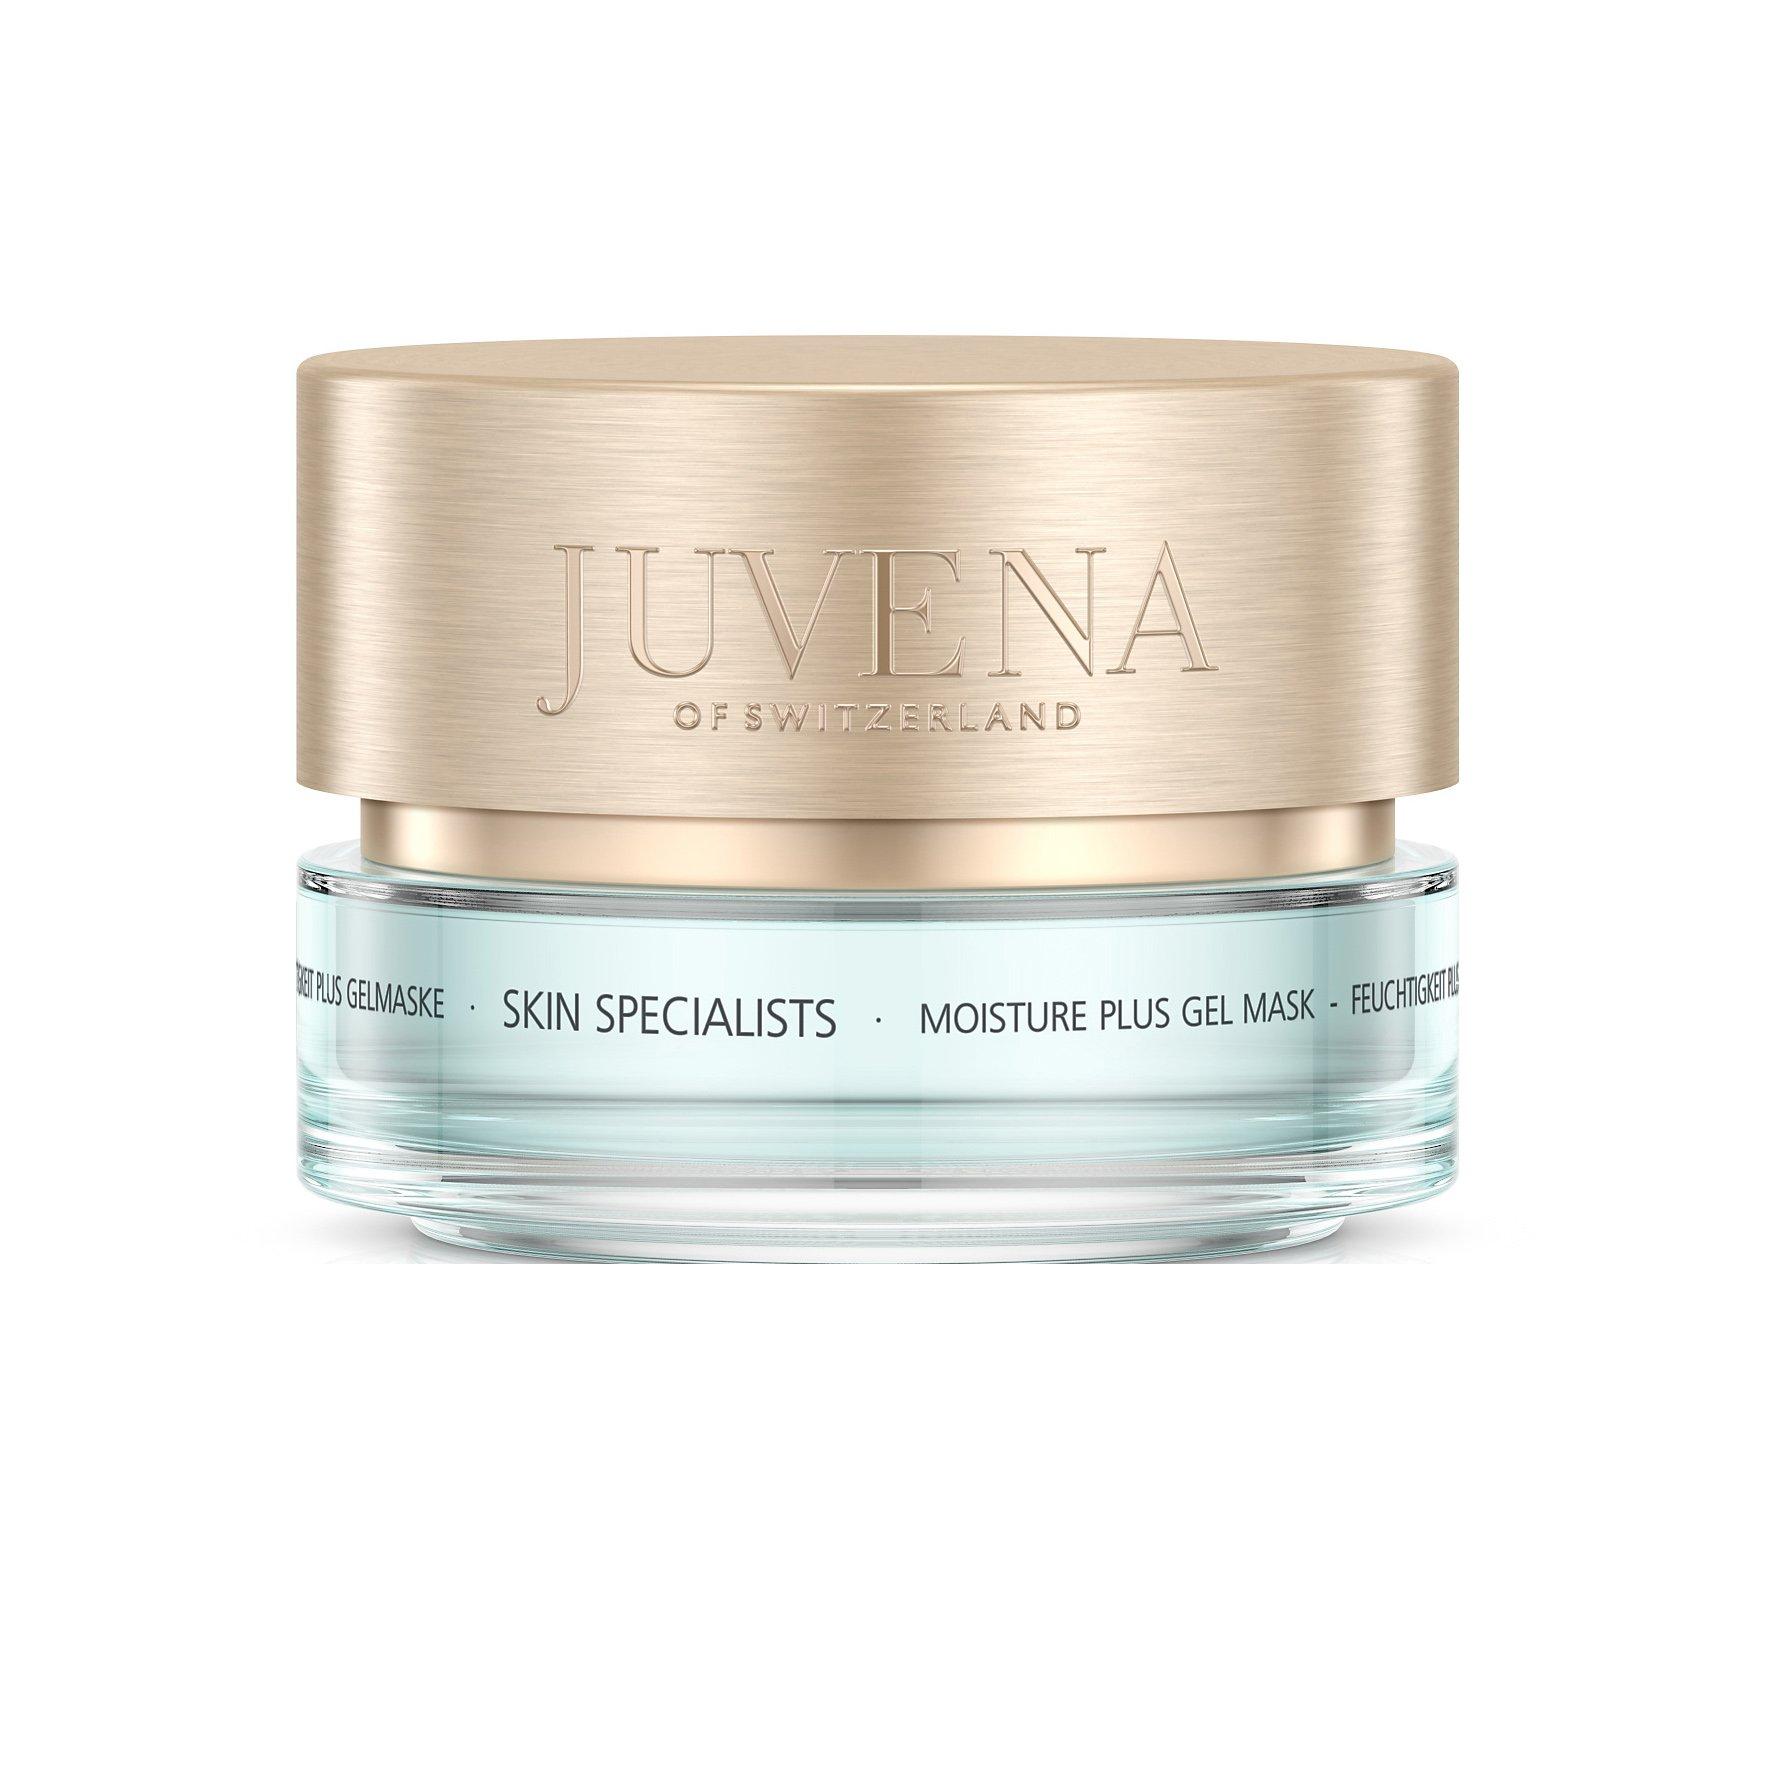 Juvena Skin Specialists Moisture Plus Gel Mask Ενυδατική Μάσκα Gel για Αφυδατωμένο, Καταπονημένο & Ευερέθιστο Δέρμα 75ml